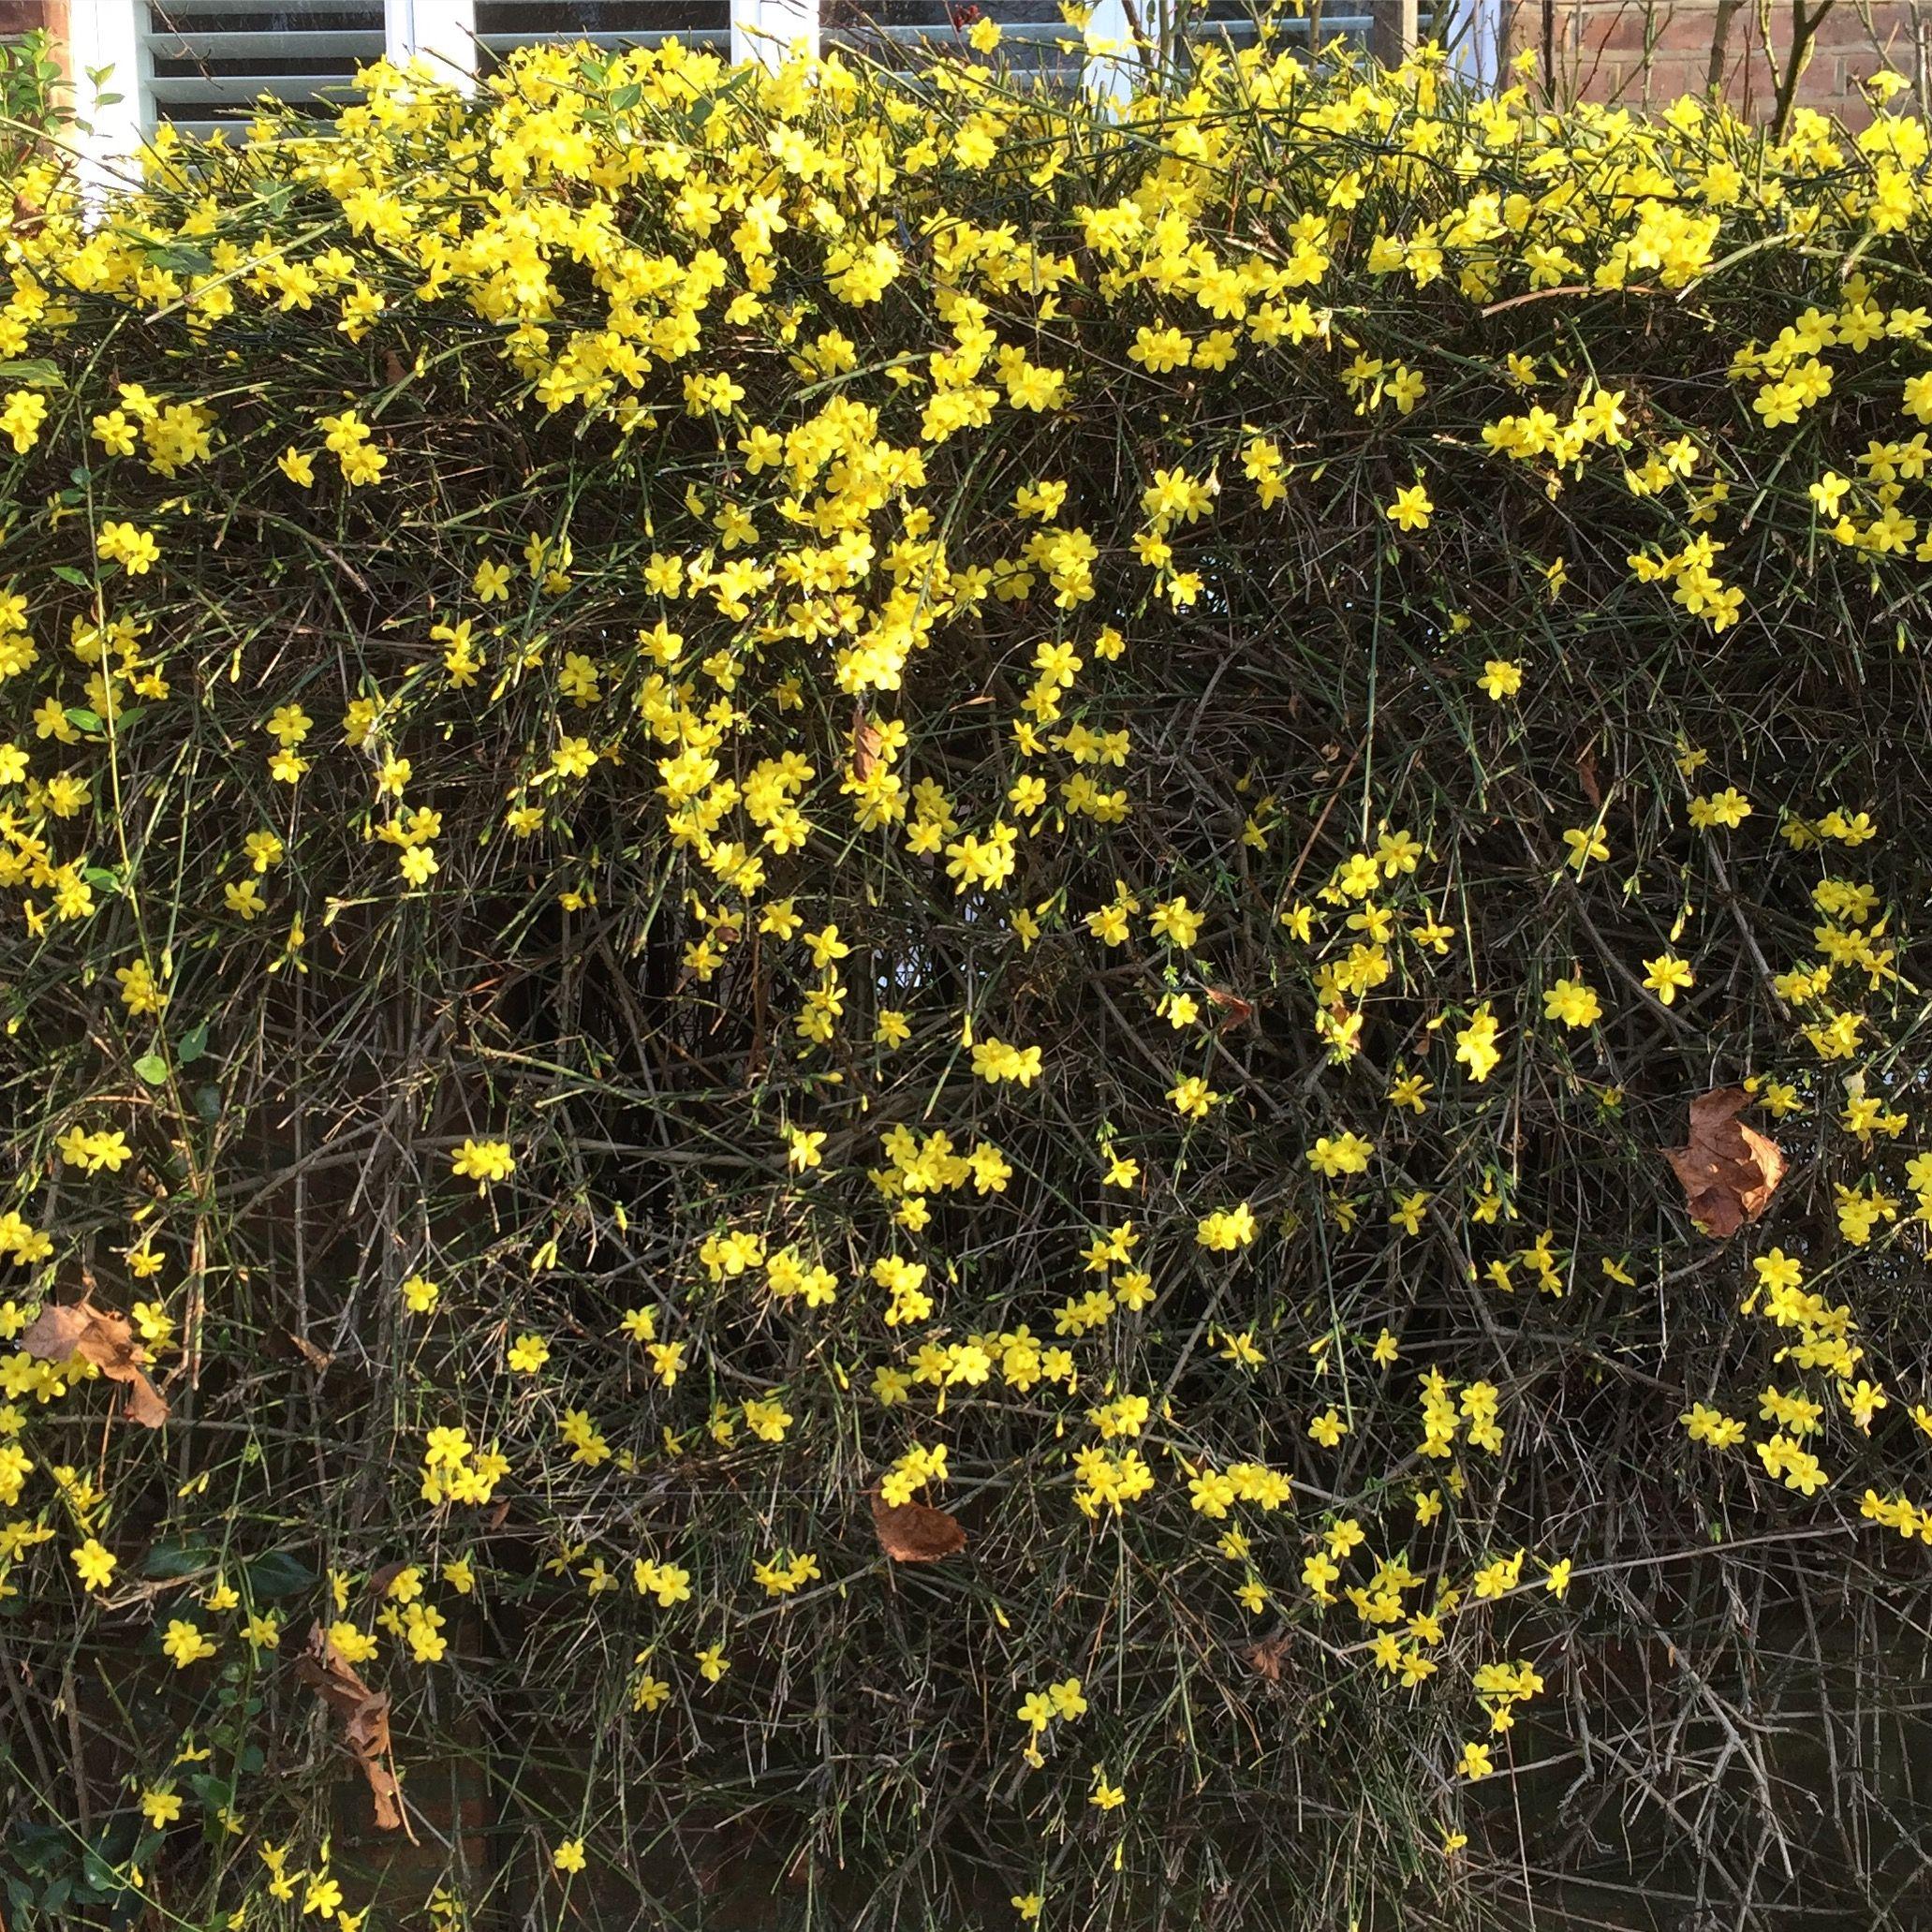 Winter jasmine jasminum nudiflorum lovely winter hedge hedges winter jasmine jasminum nudiflorum lovely winter hedge izmirmasajfo Image collections